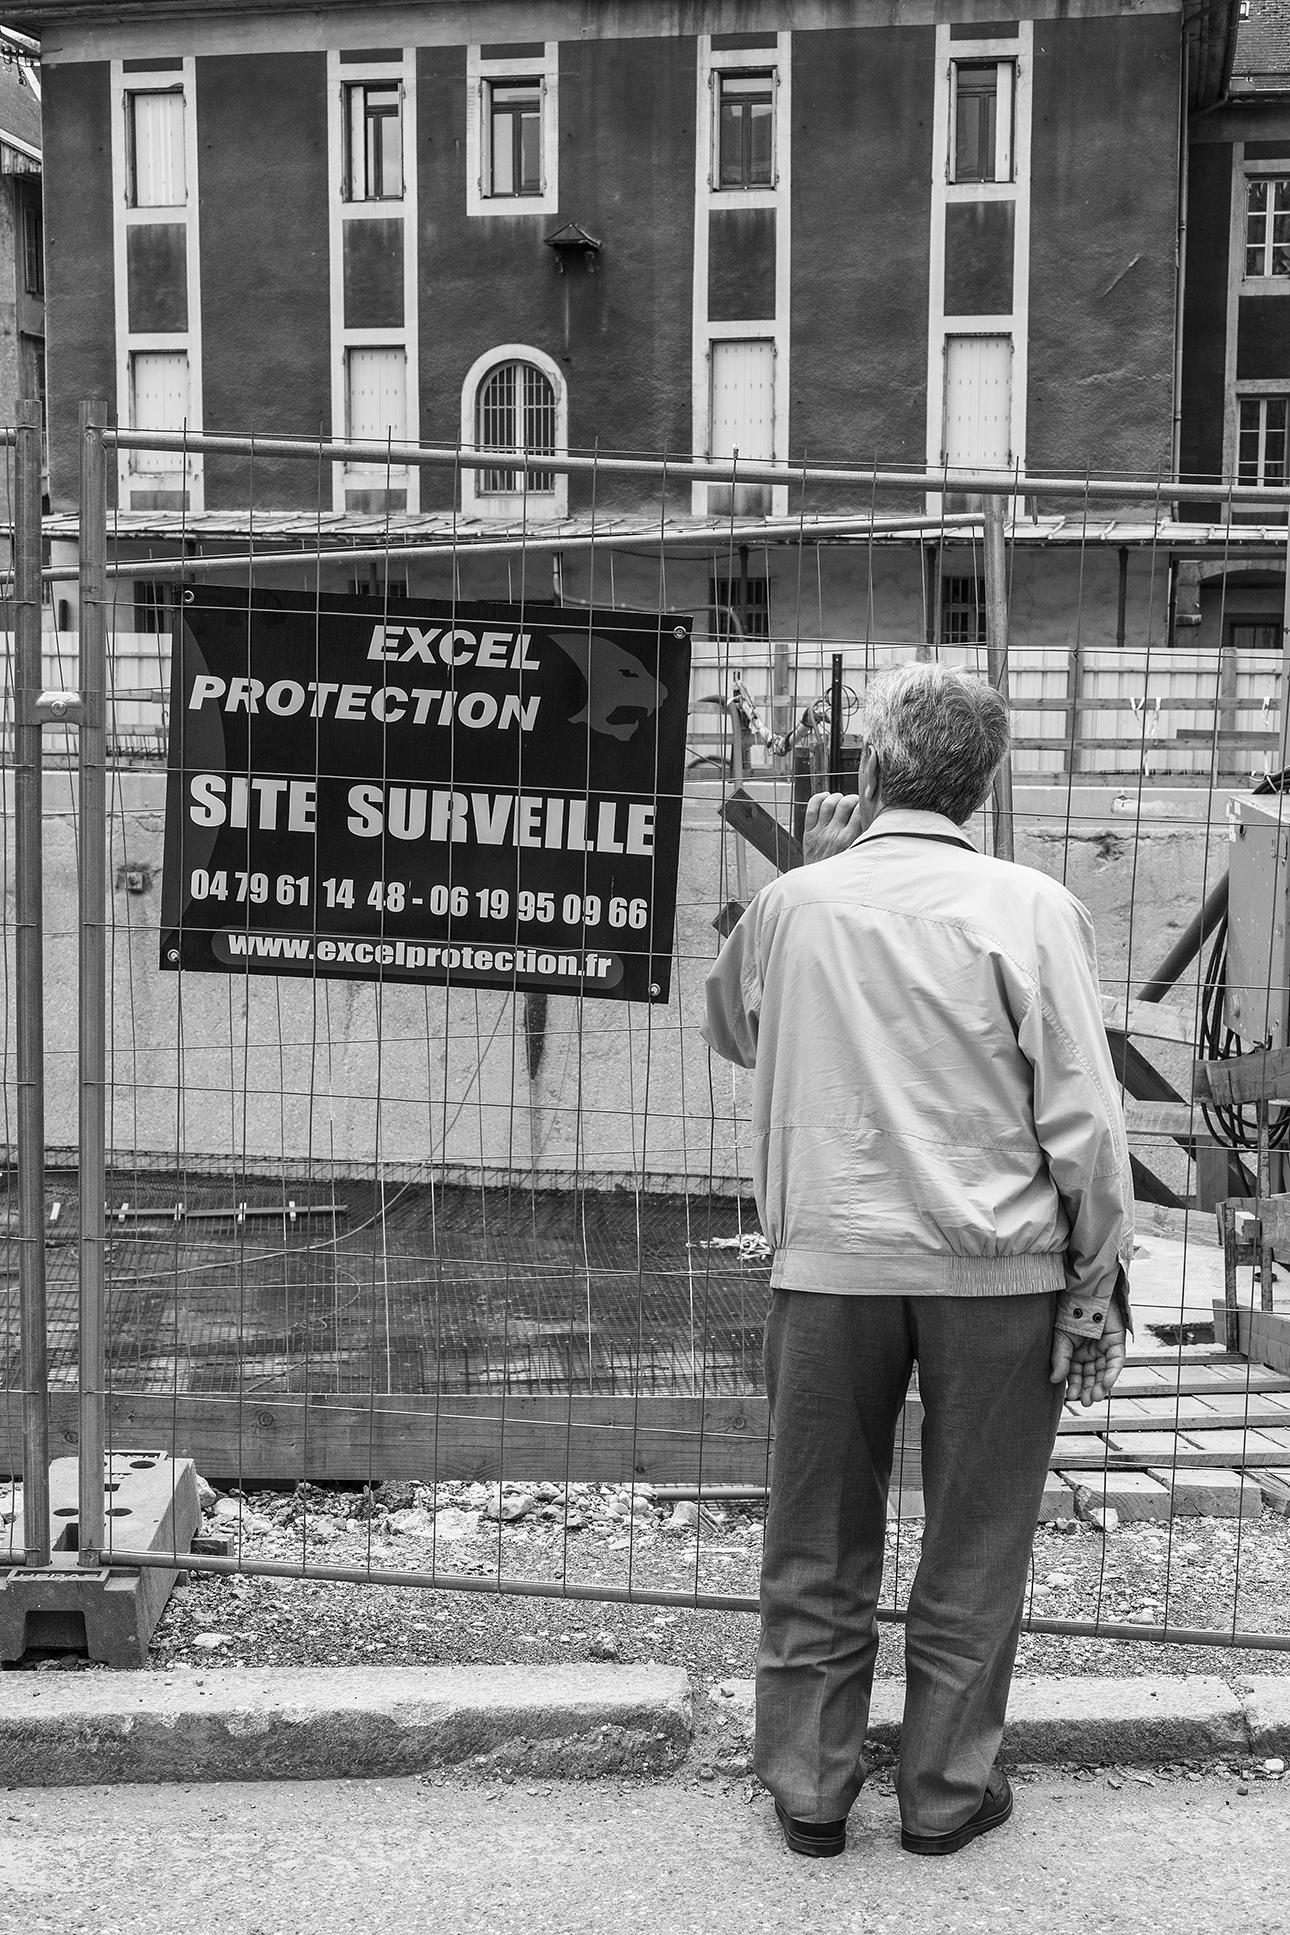 site-surveille-Chambery-juin-2011.jpg